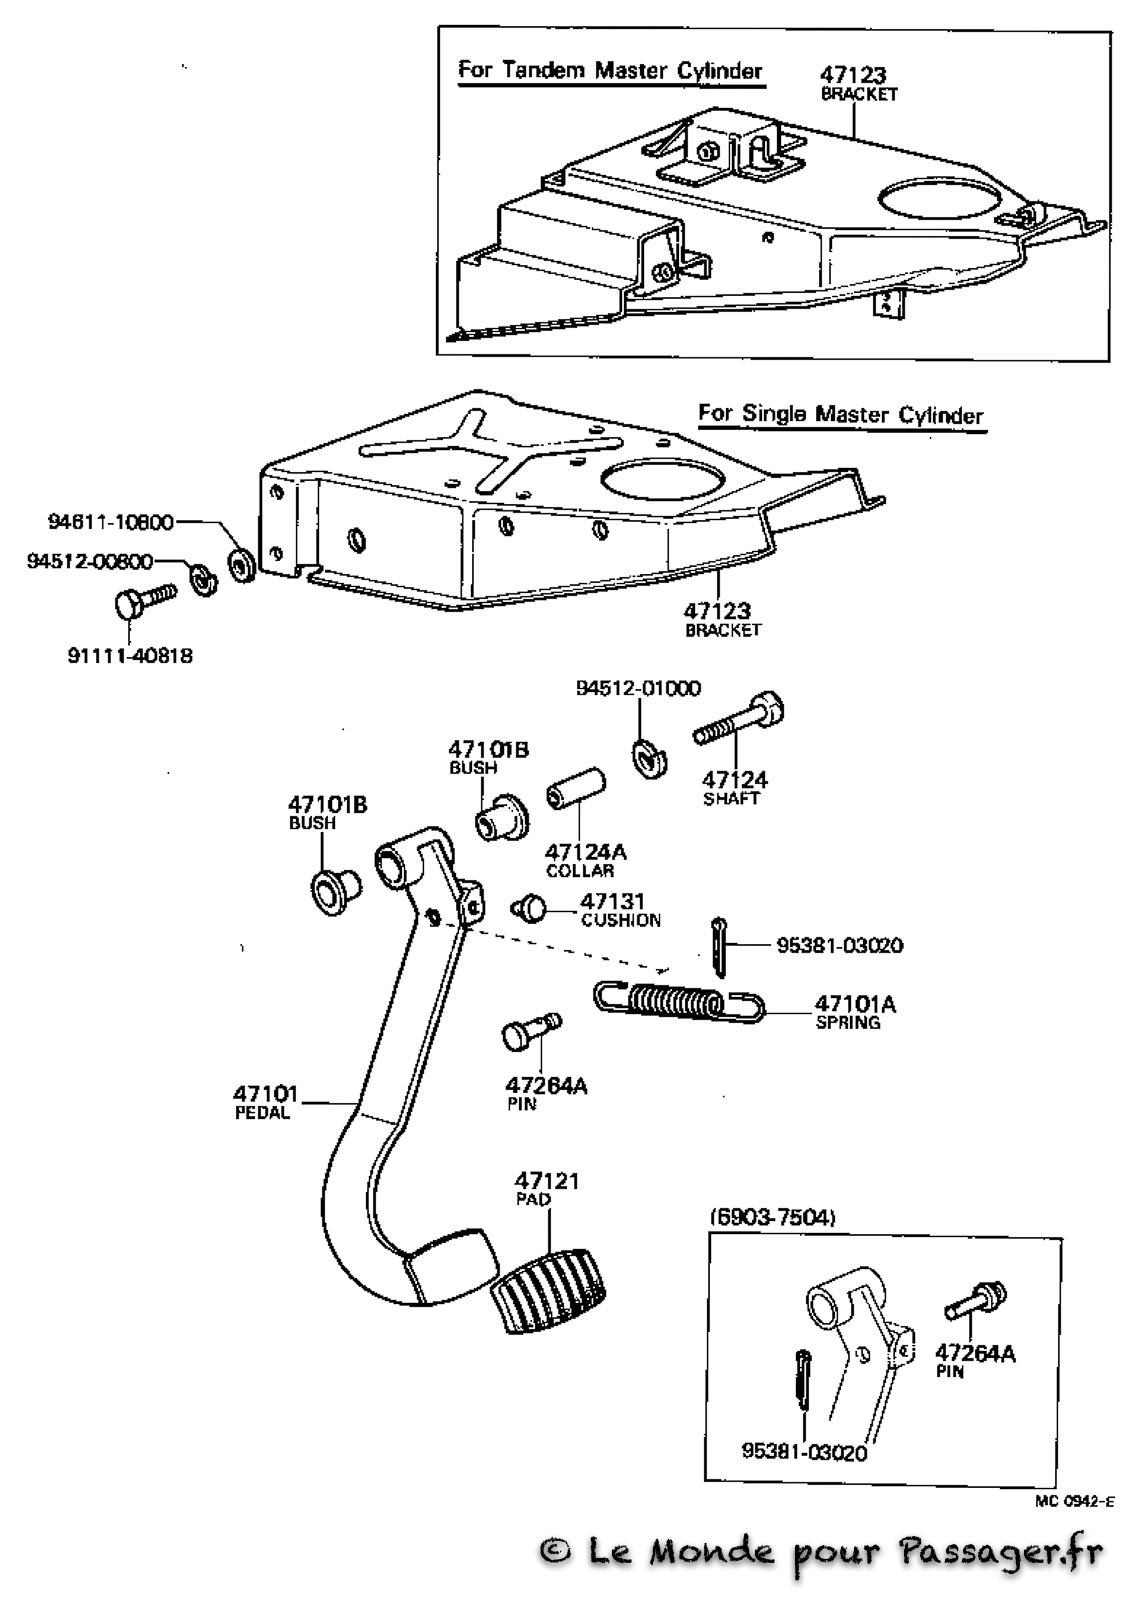 Fj55-Eclatés-Techniques113